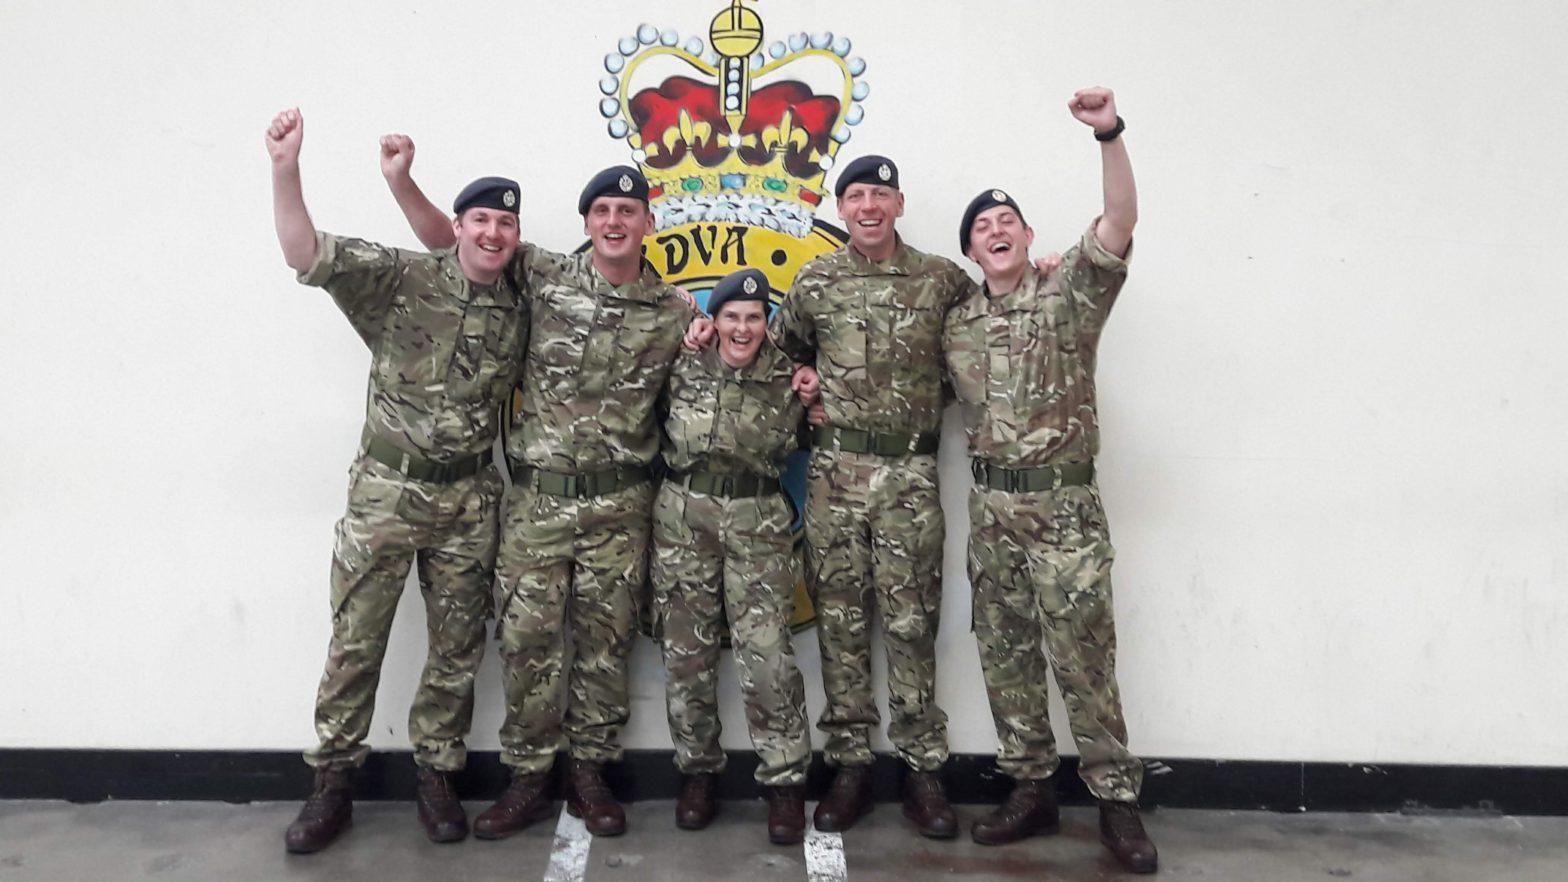 RAF Reservist Squadron